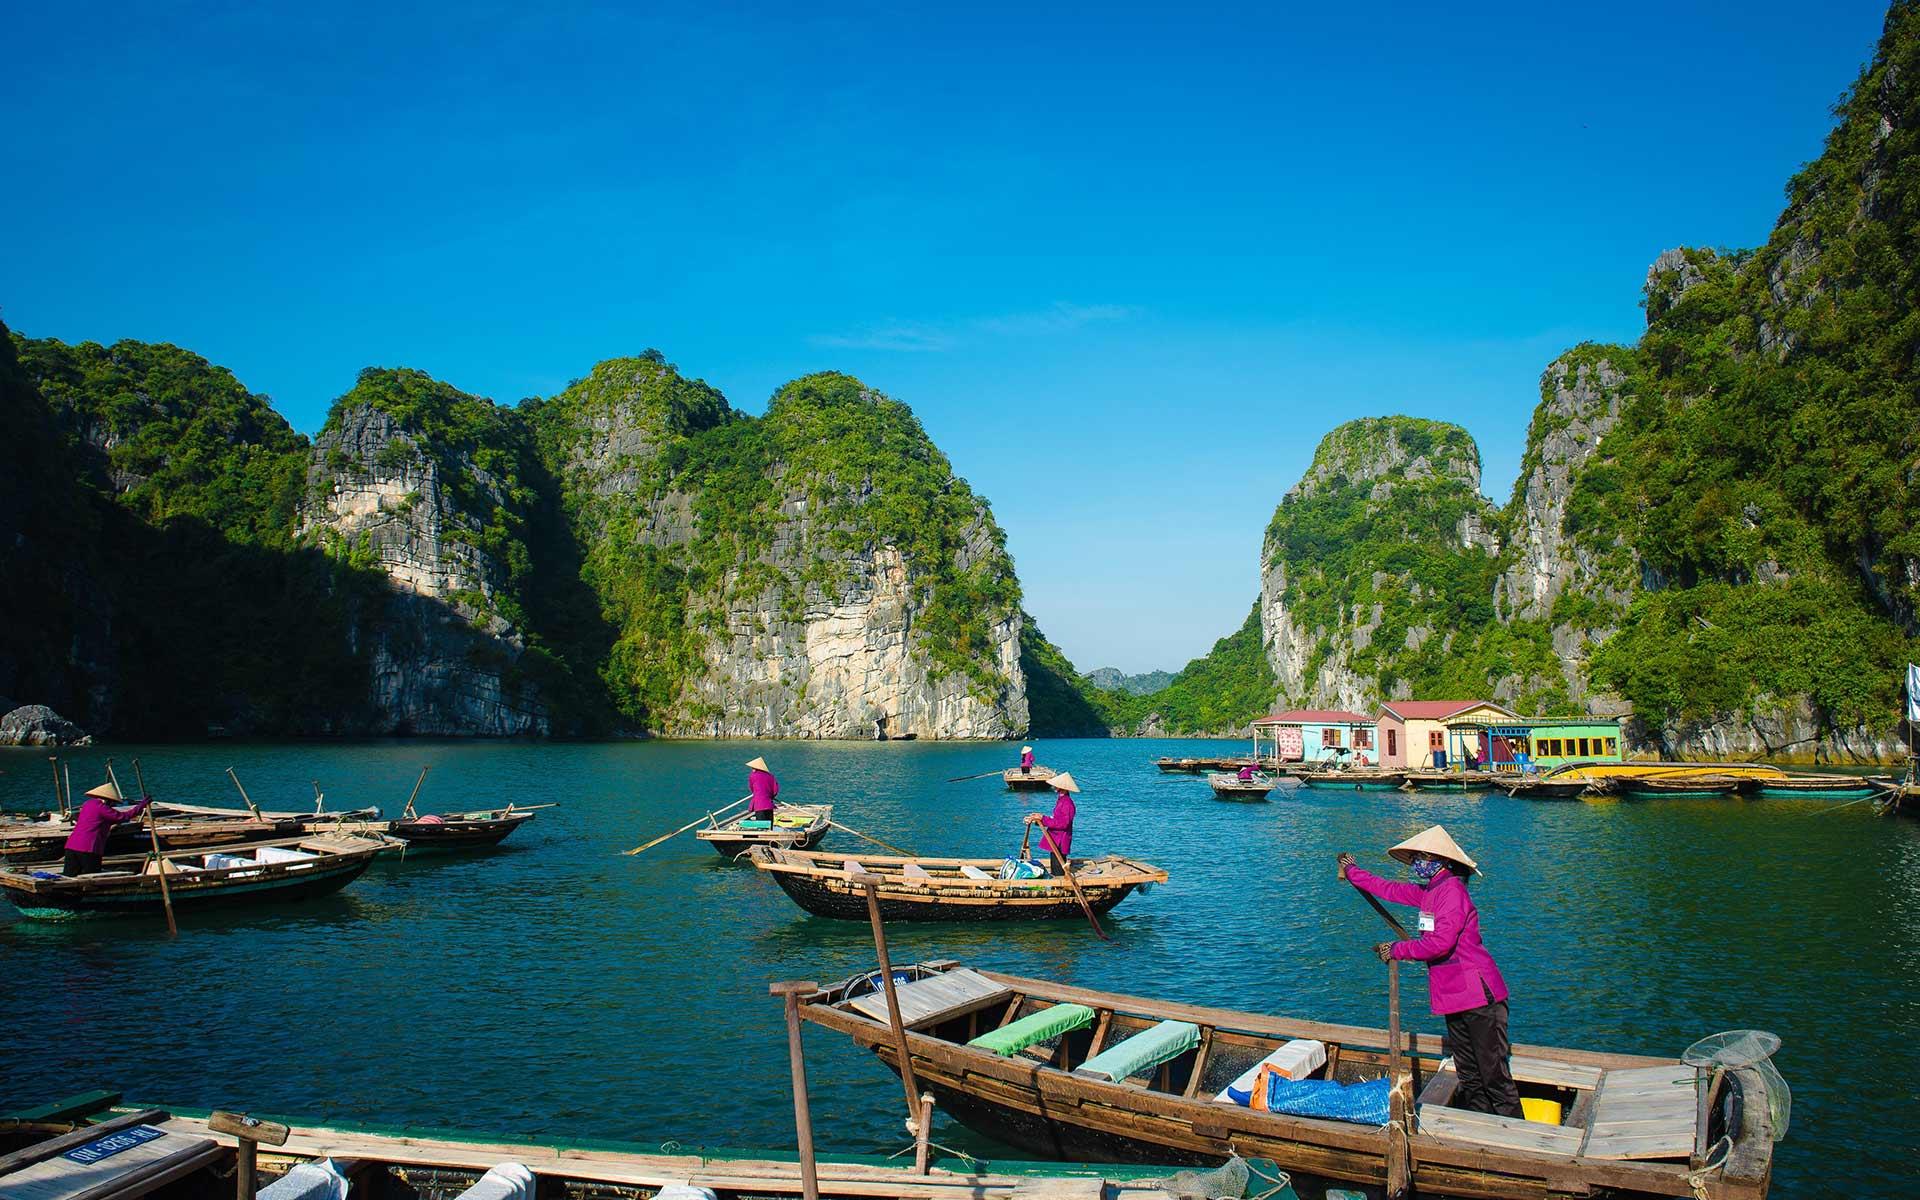 Fishing village in Halong Bay, Vietnam